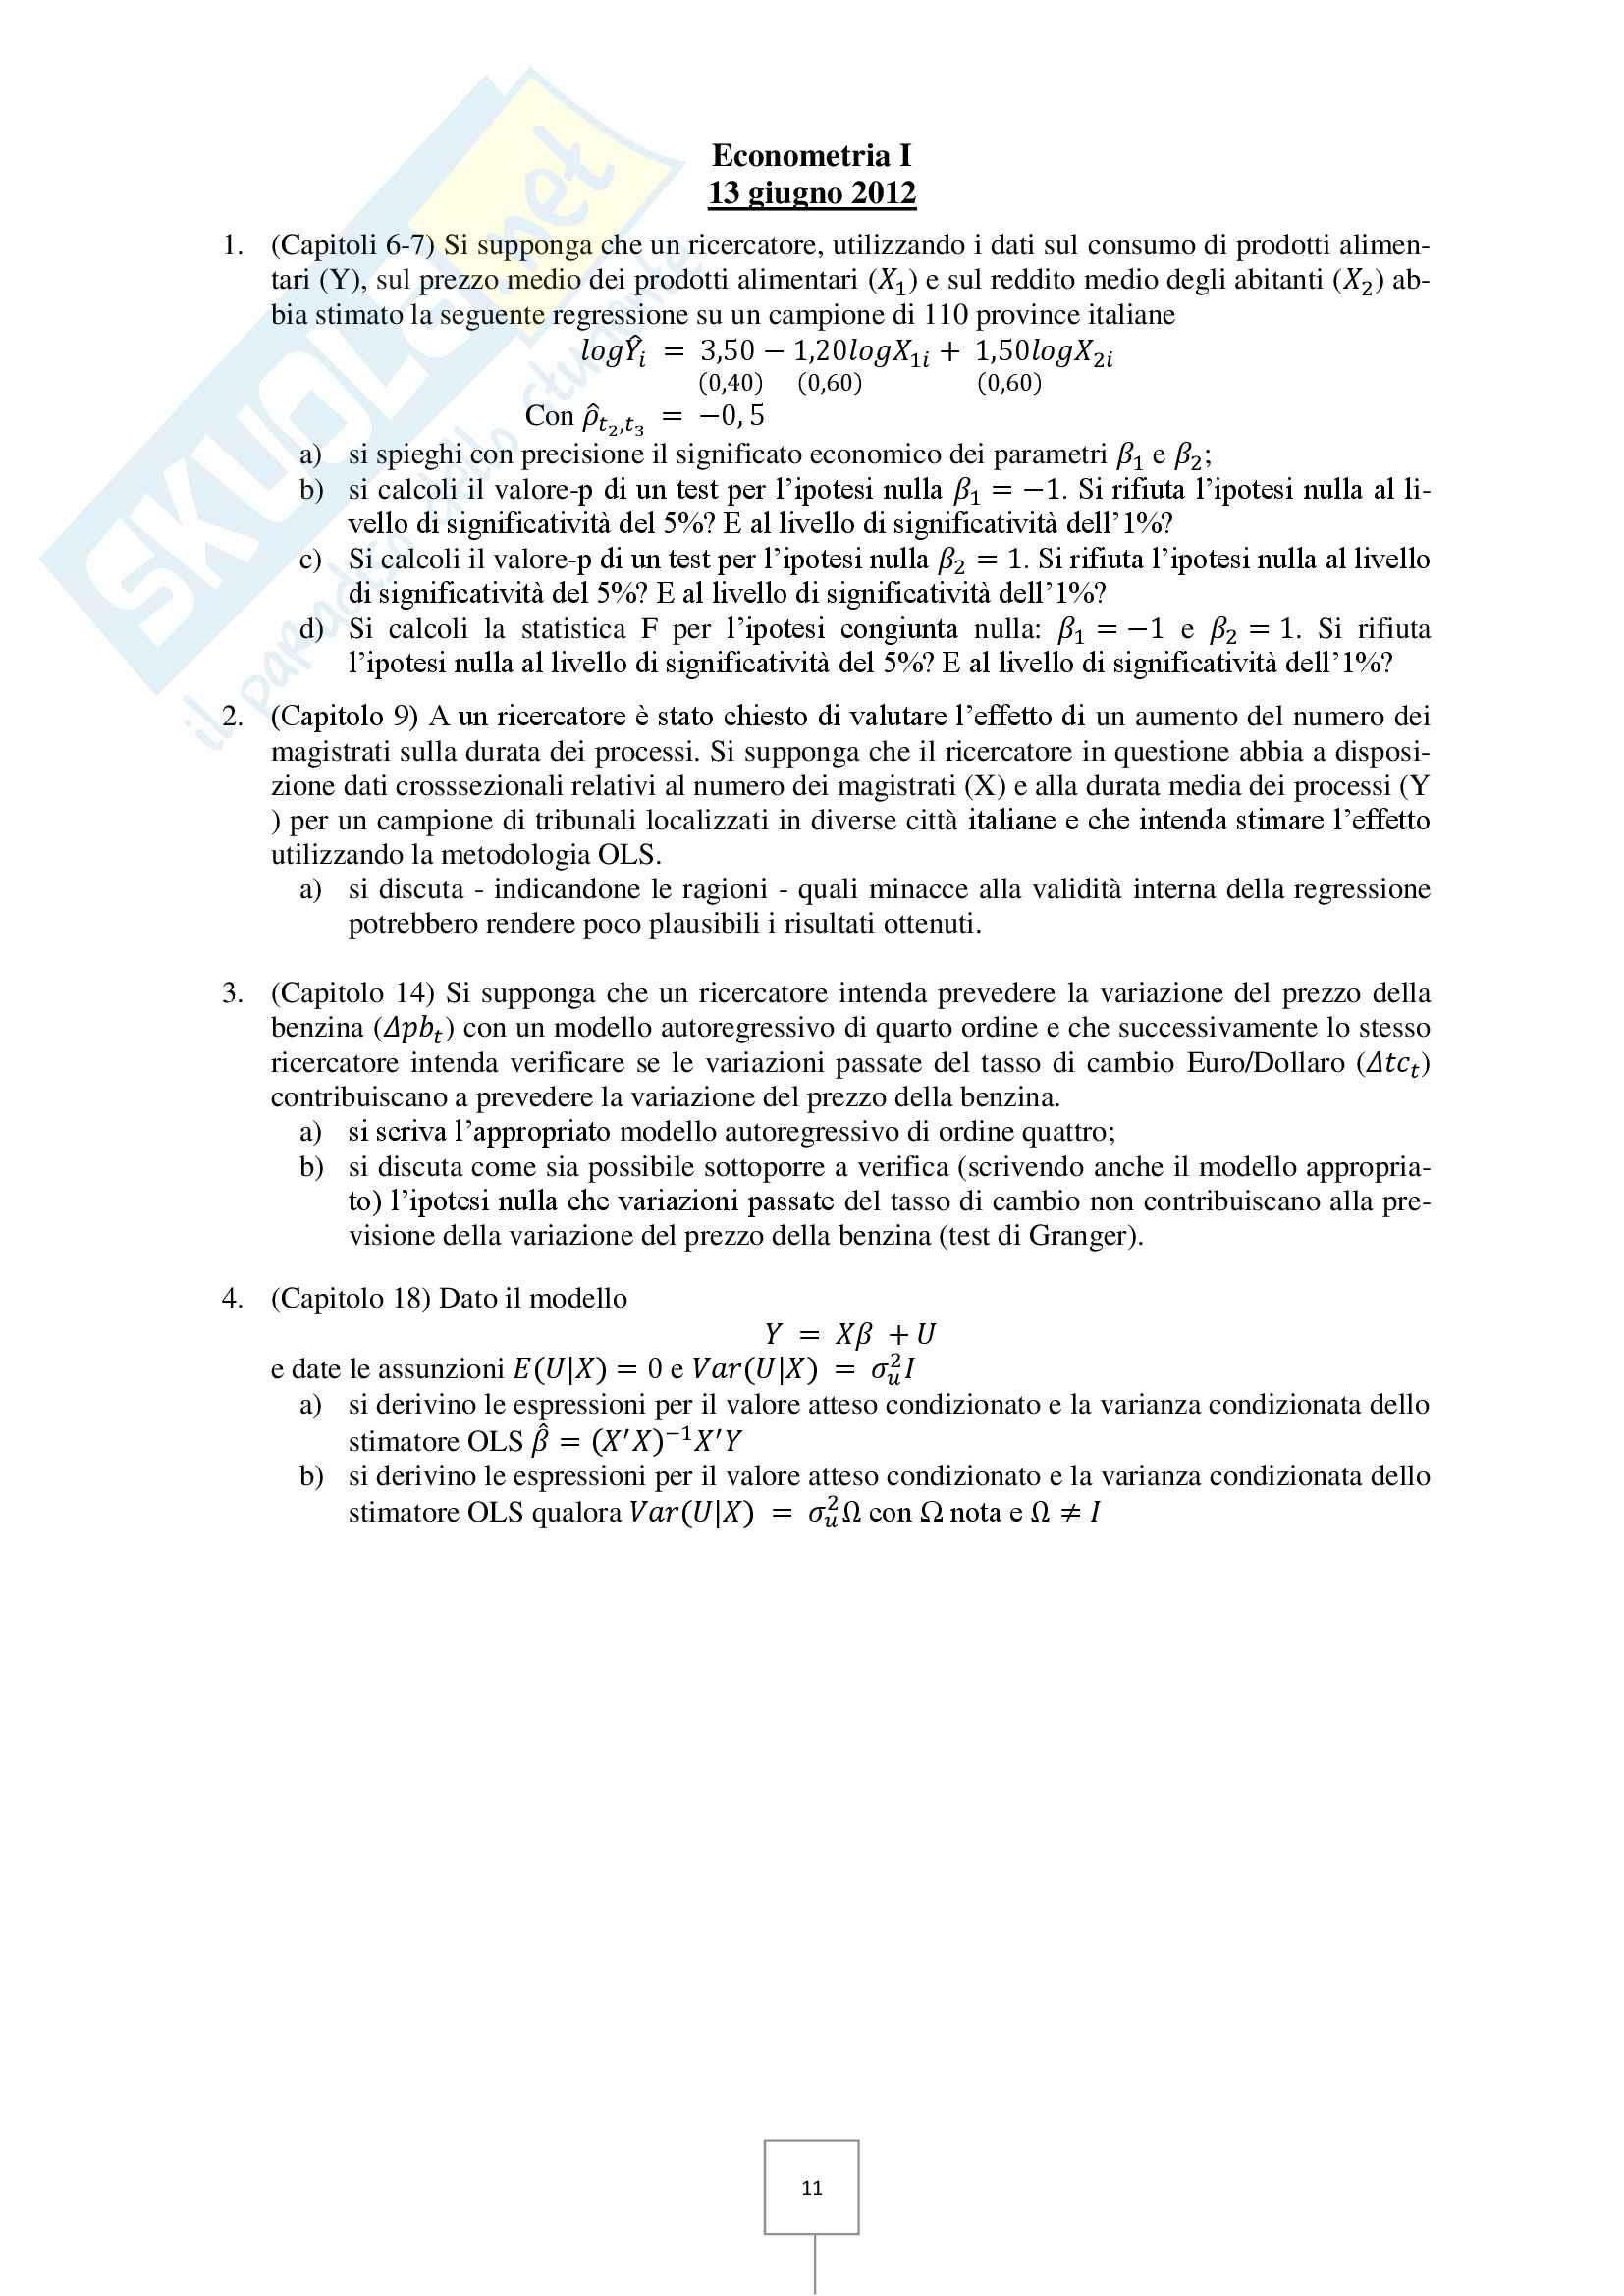 Econometria - Prove d'esame risolte Pag. 11